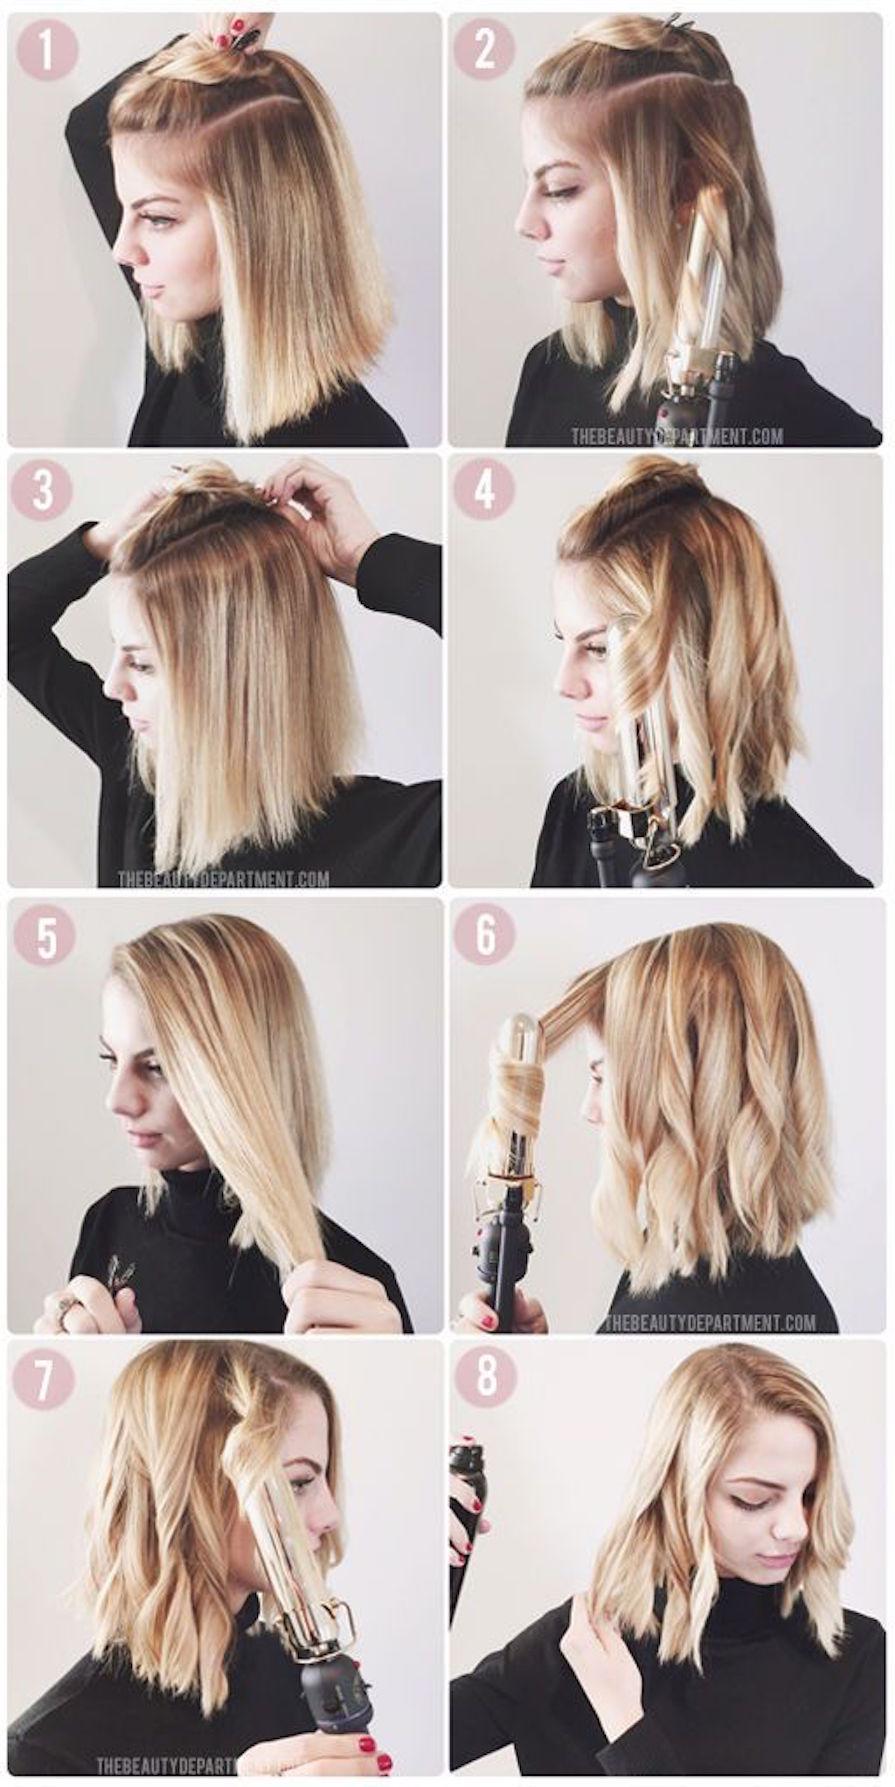 penteado-tutorial-simples-para-sair-a-noite-danielle-noce-2